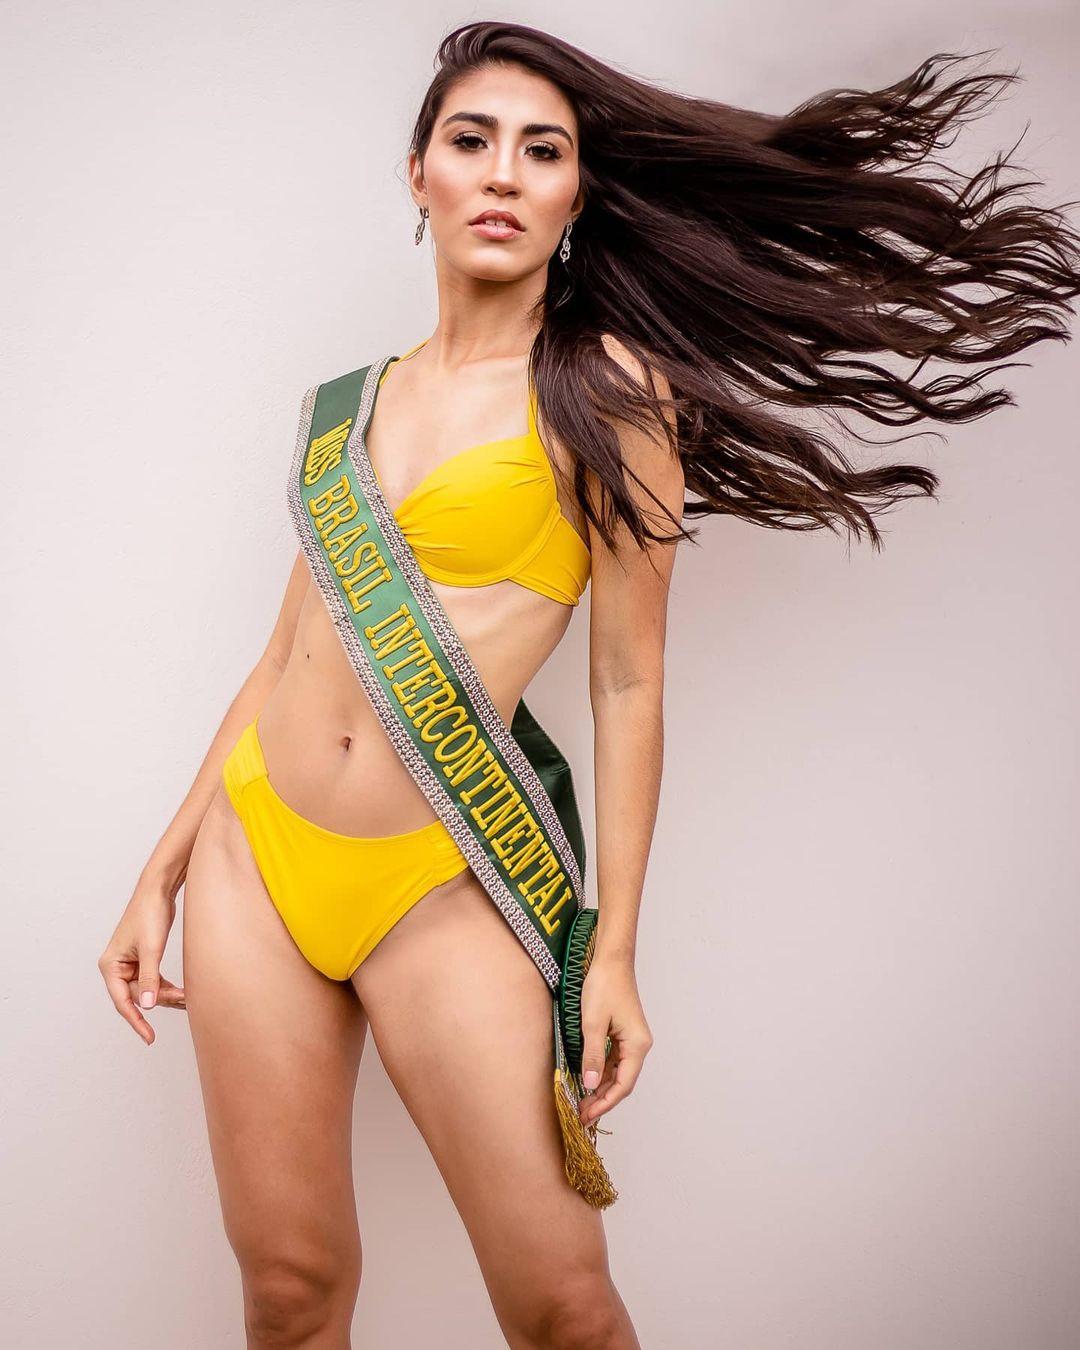 sarah chinikoski, miss brasil intercontinental 2021. Bdb8hv10